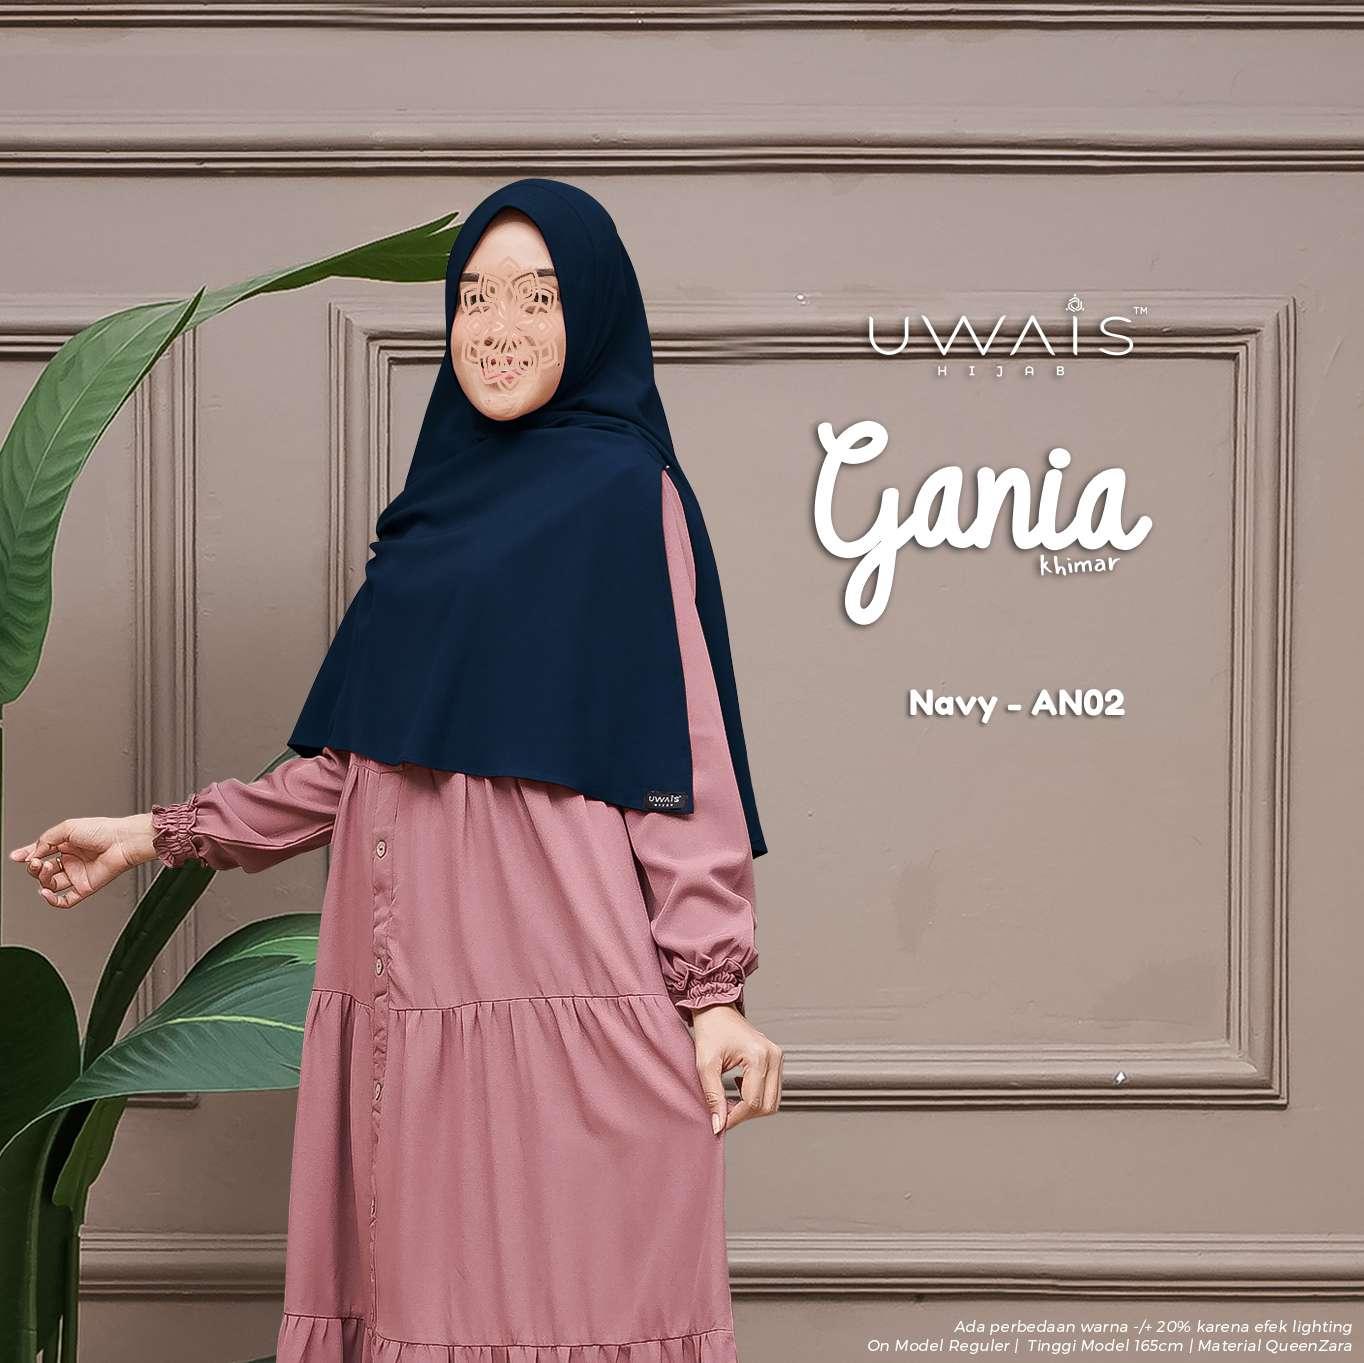 2gania_navy